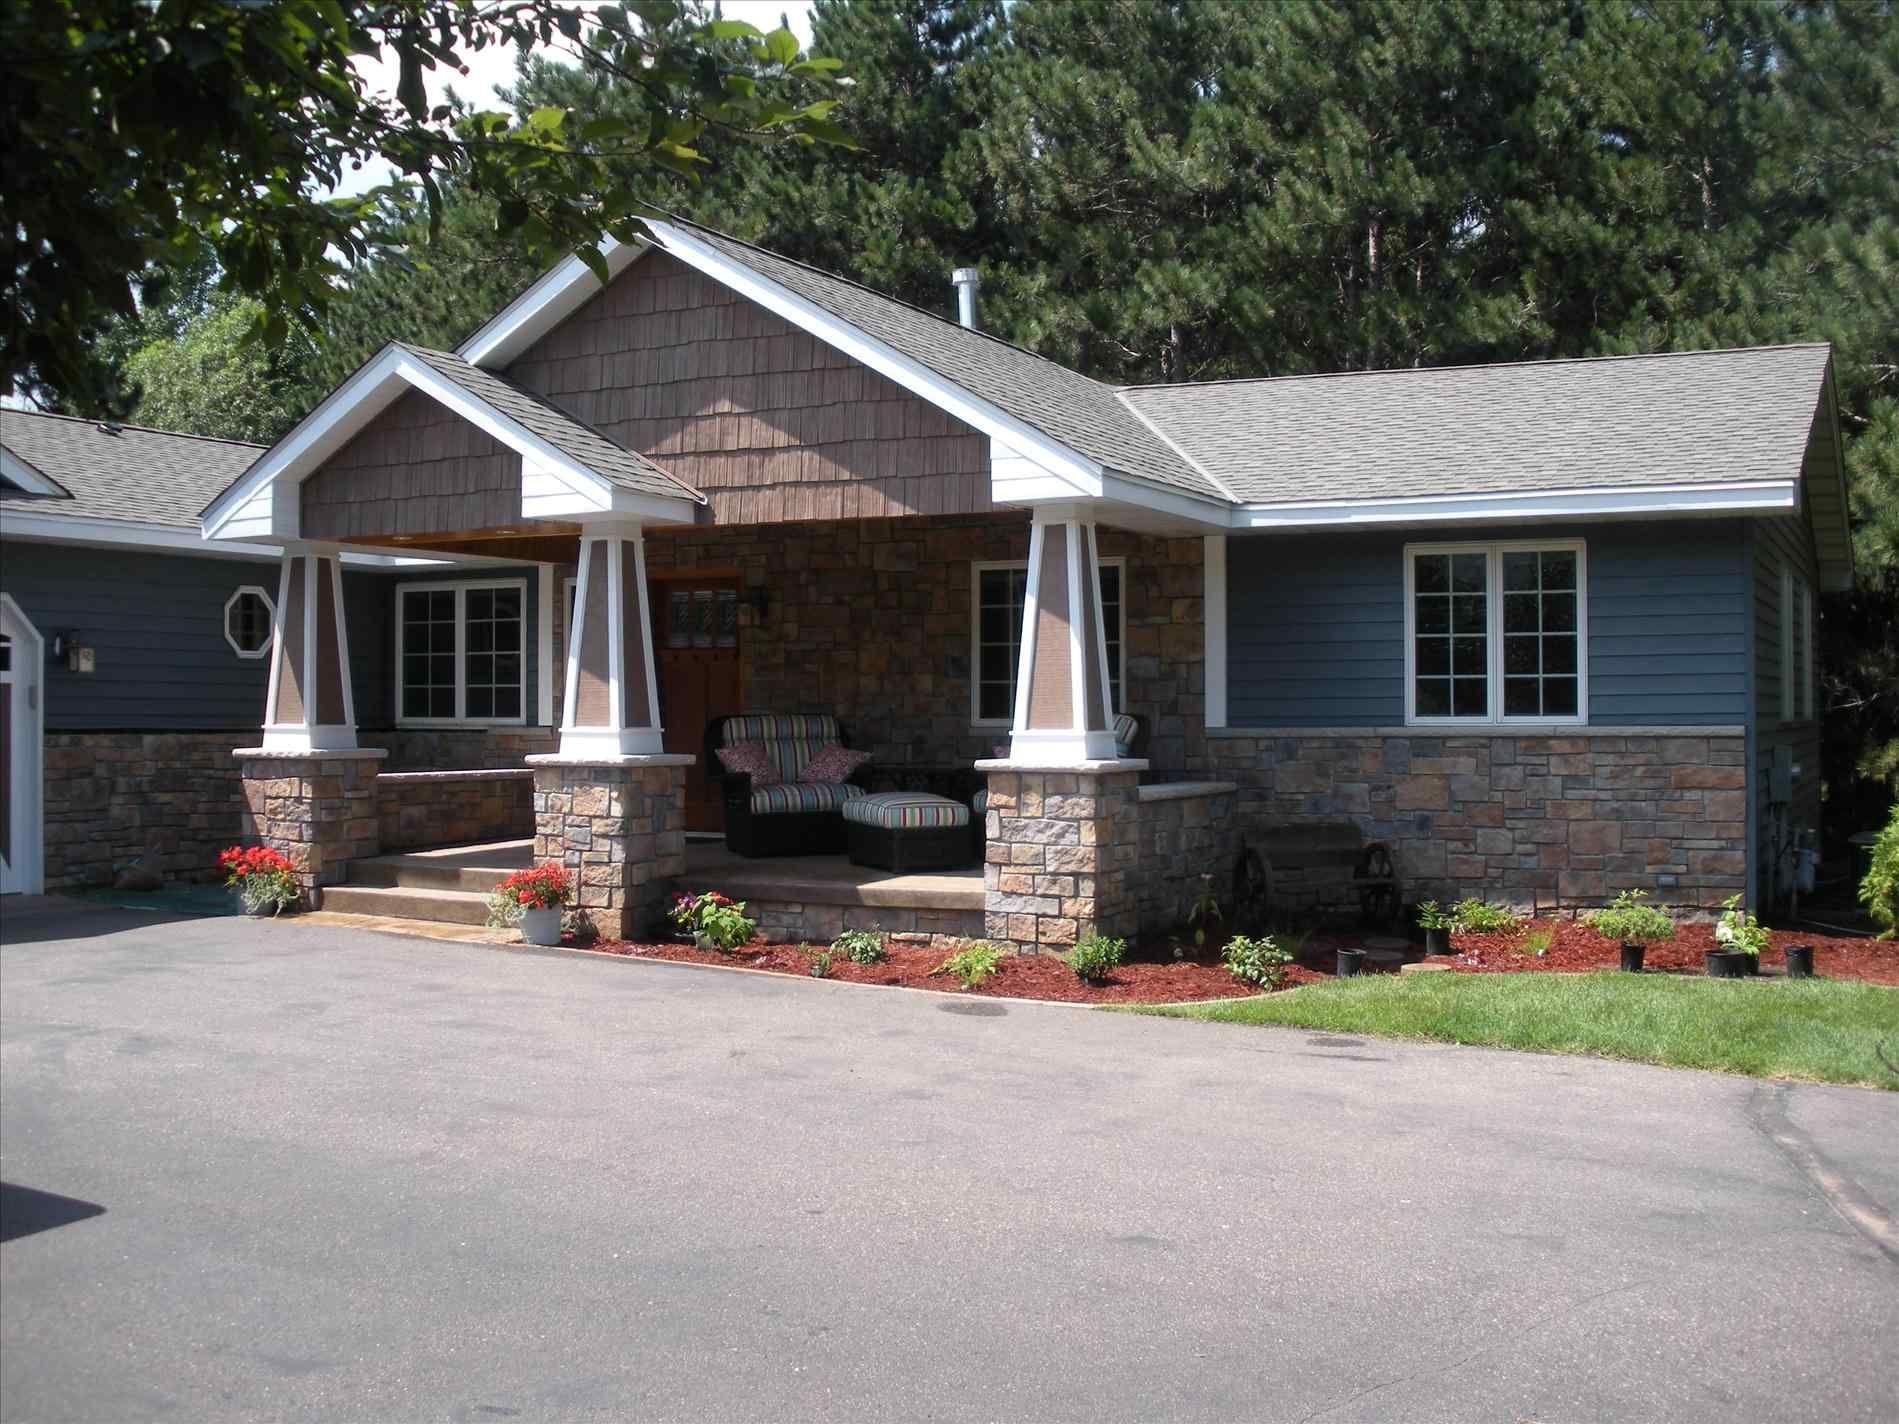 Best Colors Of Roof Shingles Roof Shingle Colors Shingle 400 x 300